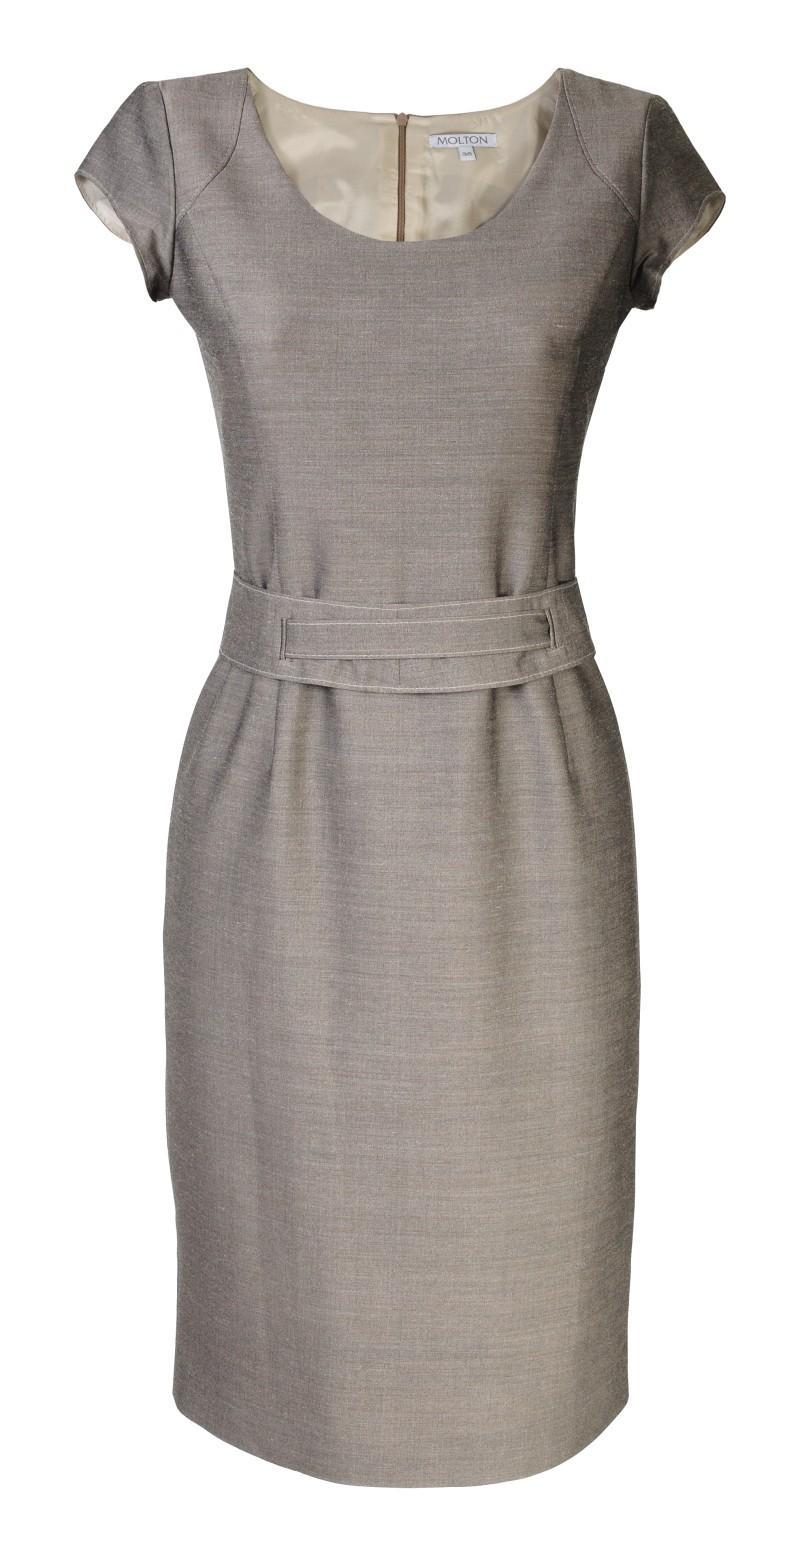 popielata sukienka Molton - wiosenna kolekcja